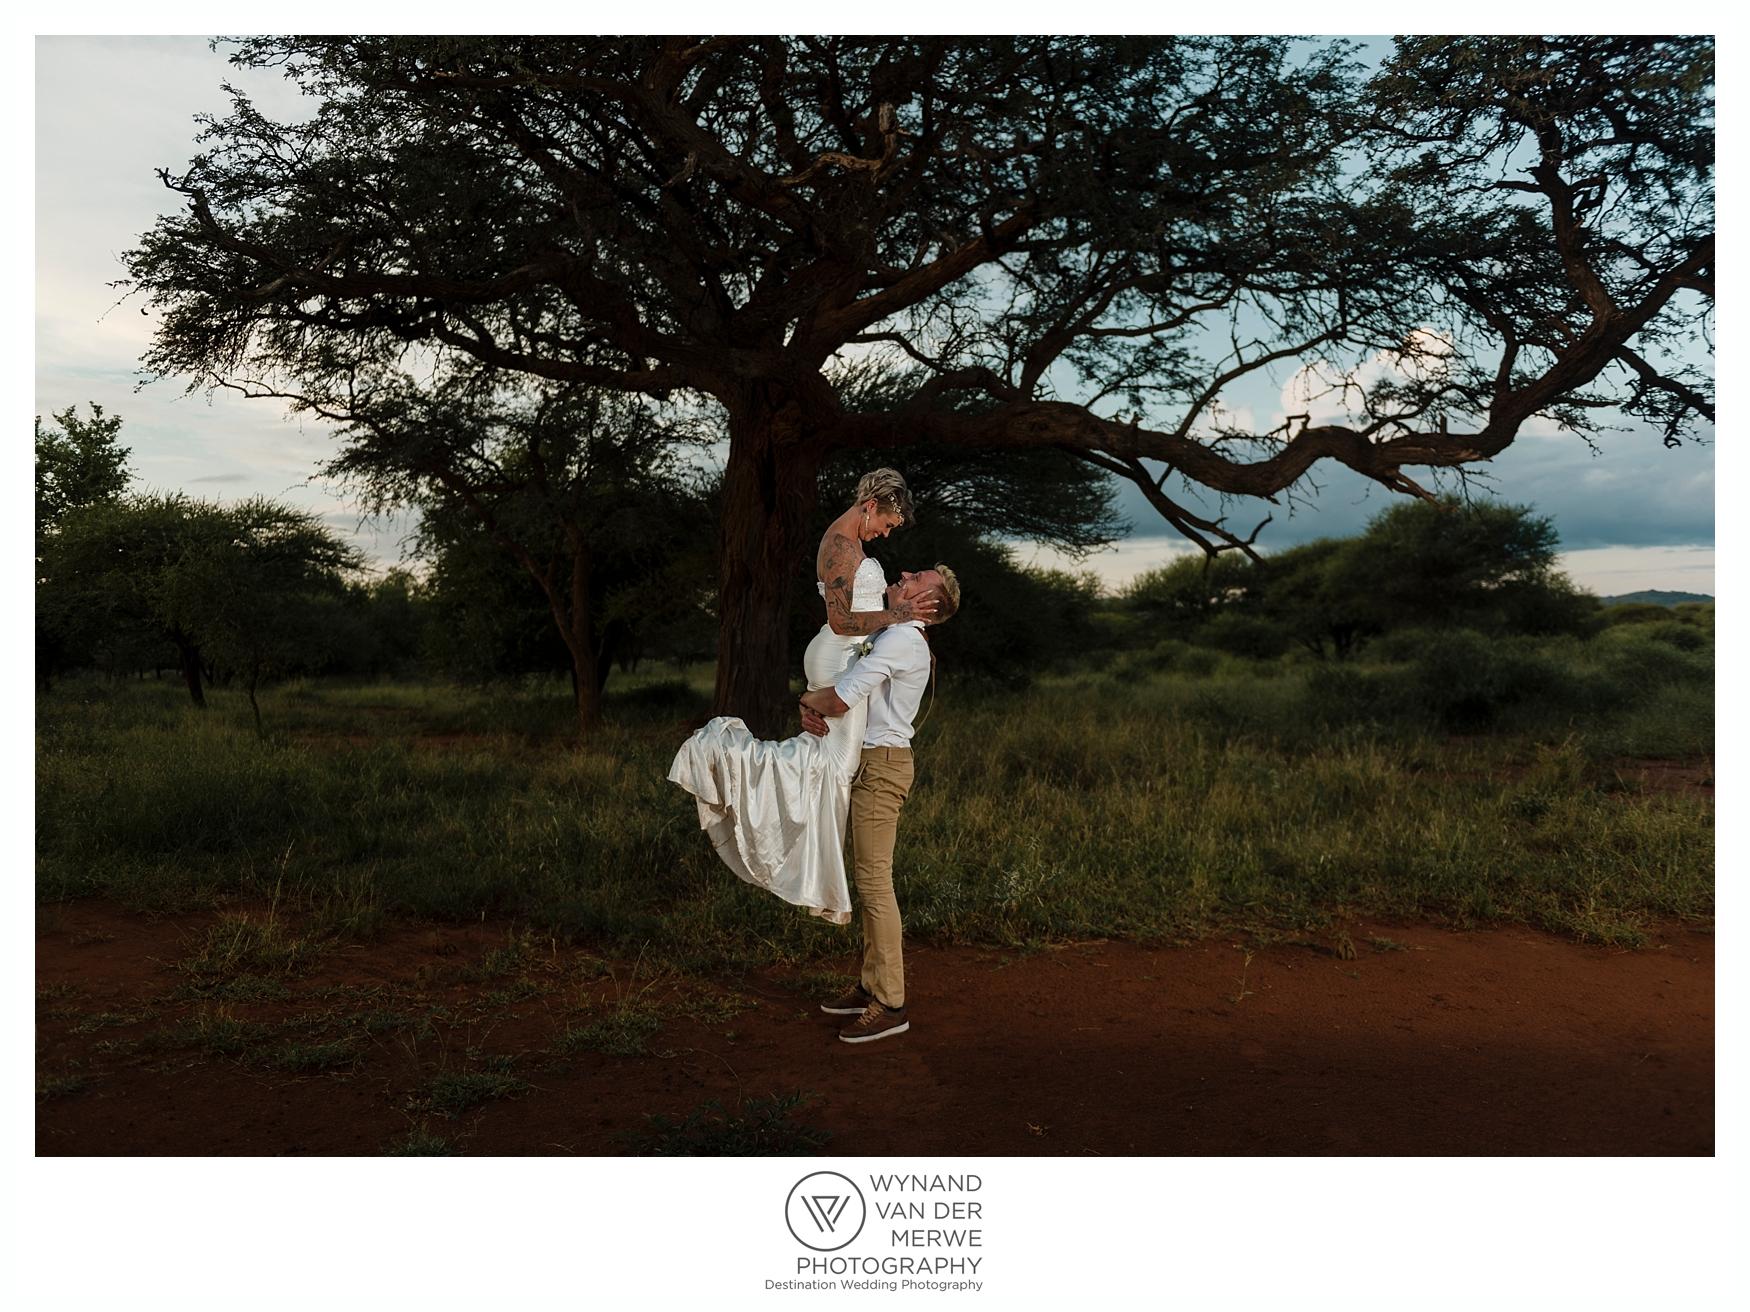 WynandvanderMerwe_weddingphotography_bushveldwedding_northam_bushveld_limpopowedding_limpopo_southafrica-286.jpg